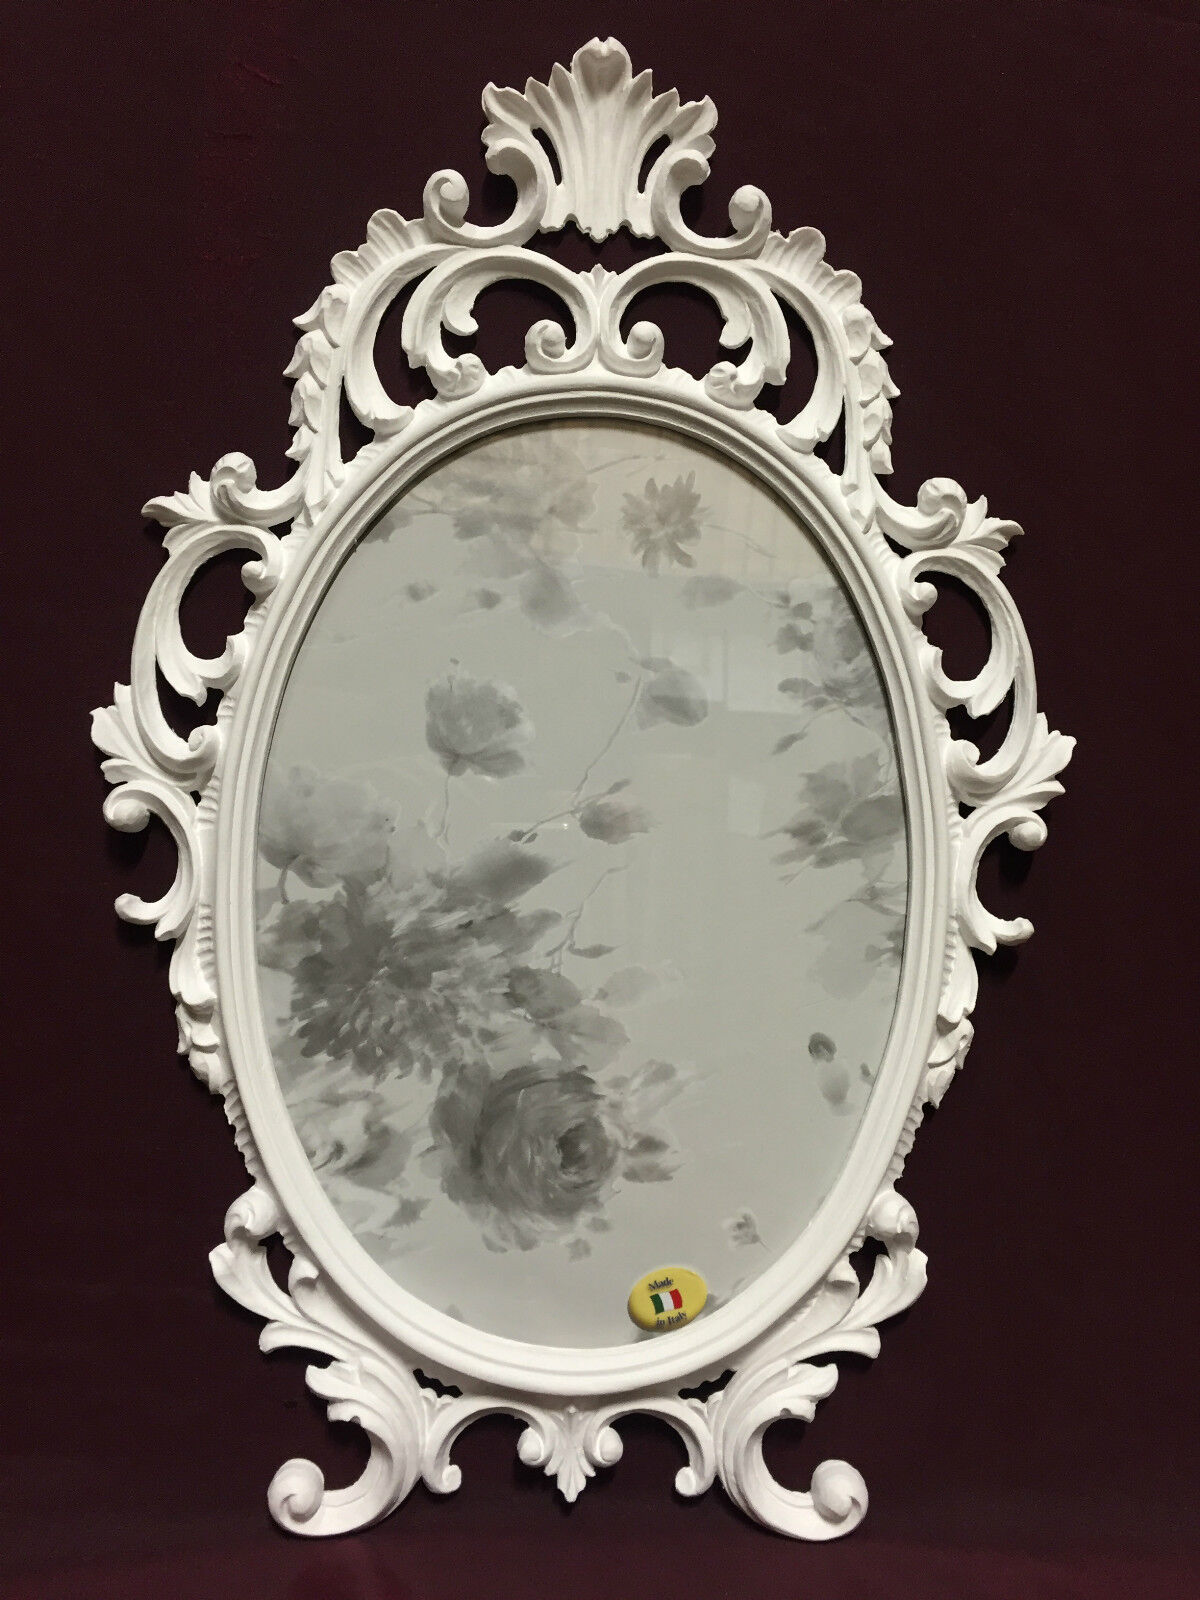 Marcos barroco blancoo alto brillo oval 43x27 43x27 43x27 marcos Antik foto marco c531 bd55d3